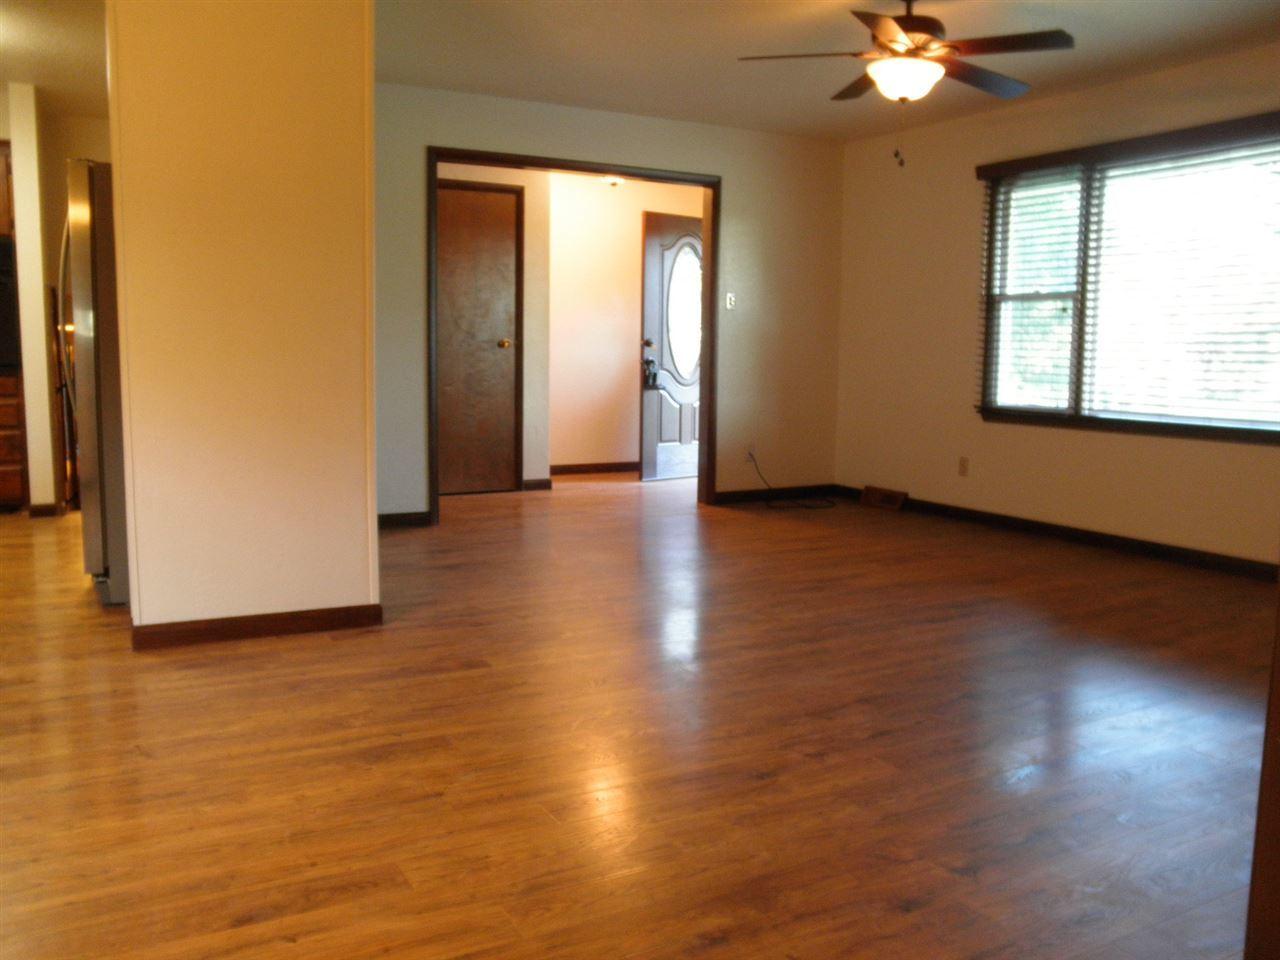 Sold Cross Sale W/ MLS | 4251 E Hubbs Estate Road  Ponca City, OK 74604 5